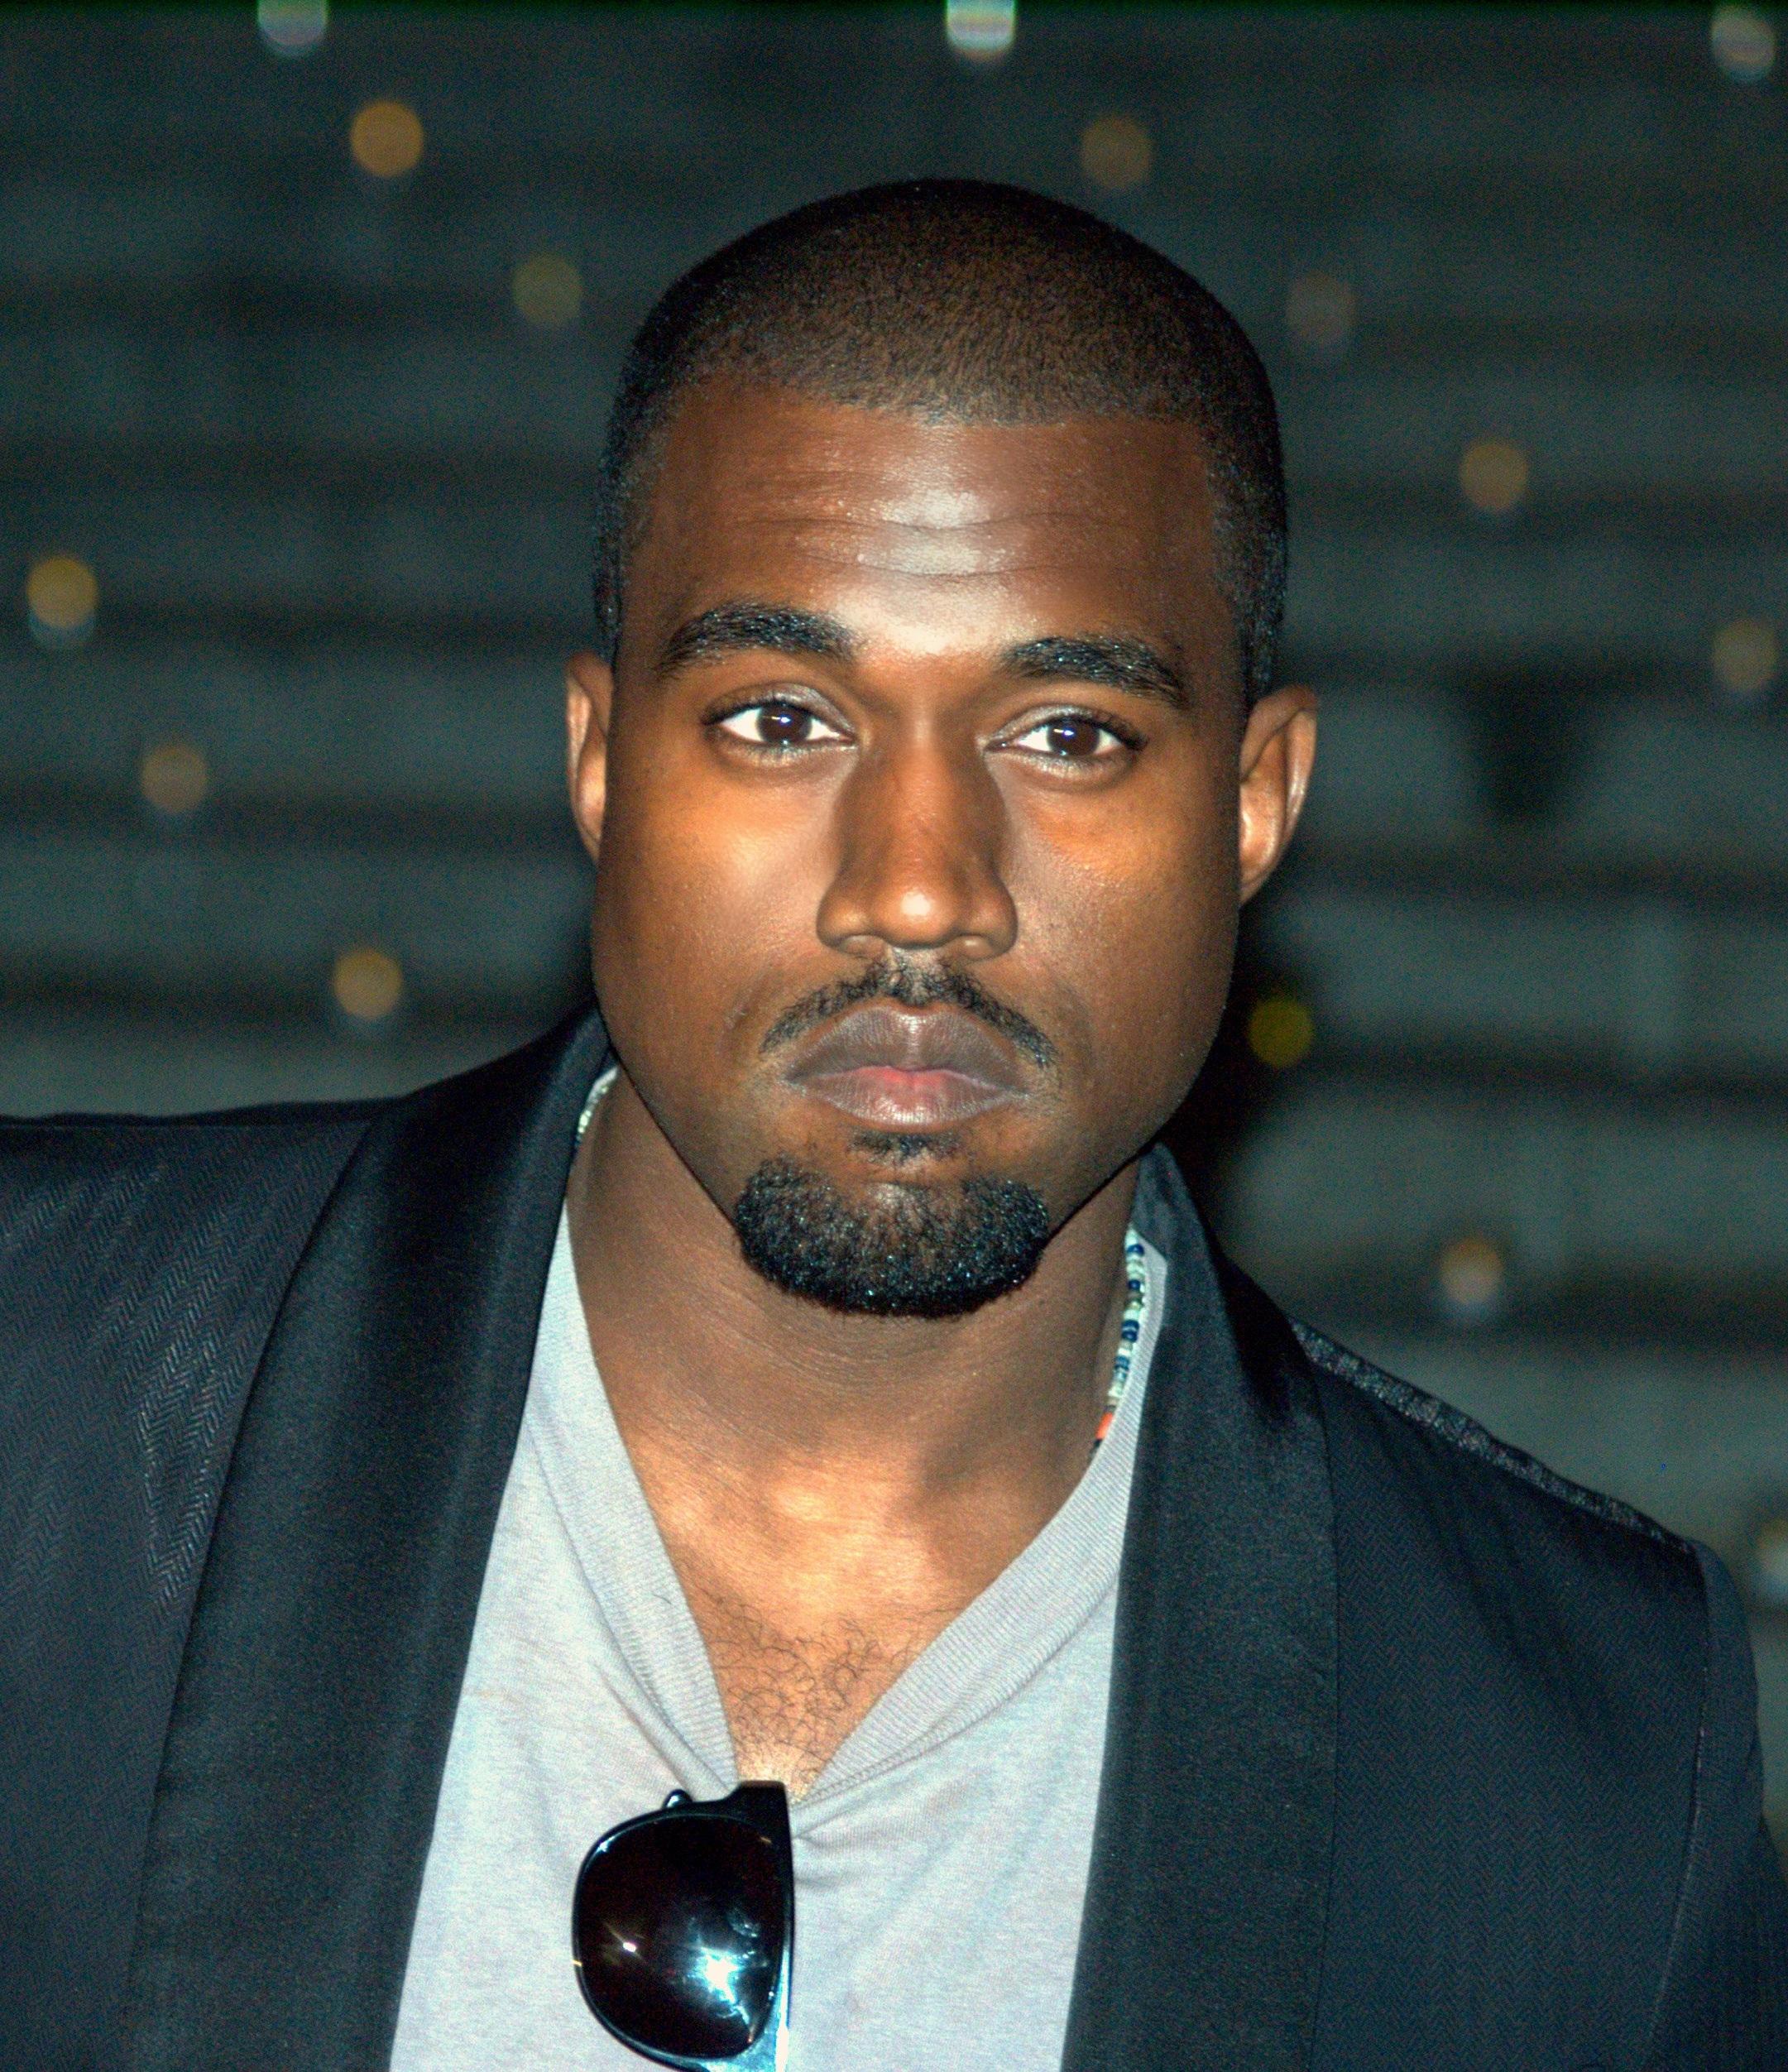 Kanye West at the 2009 Tribeca Kanye West